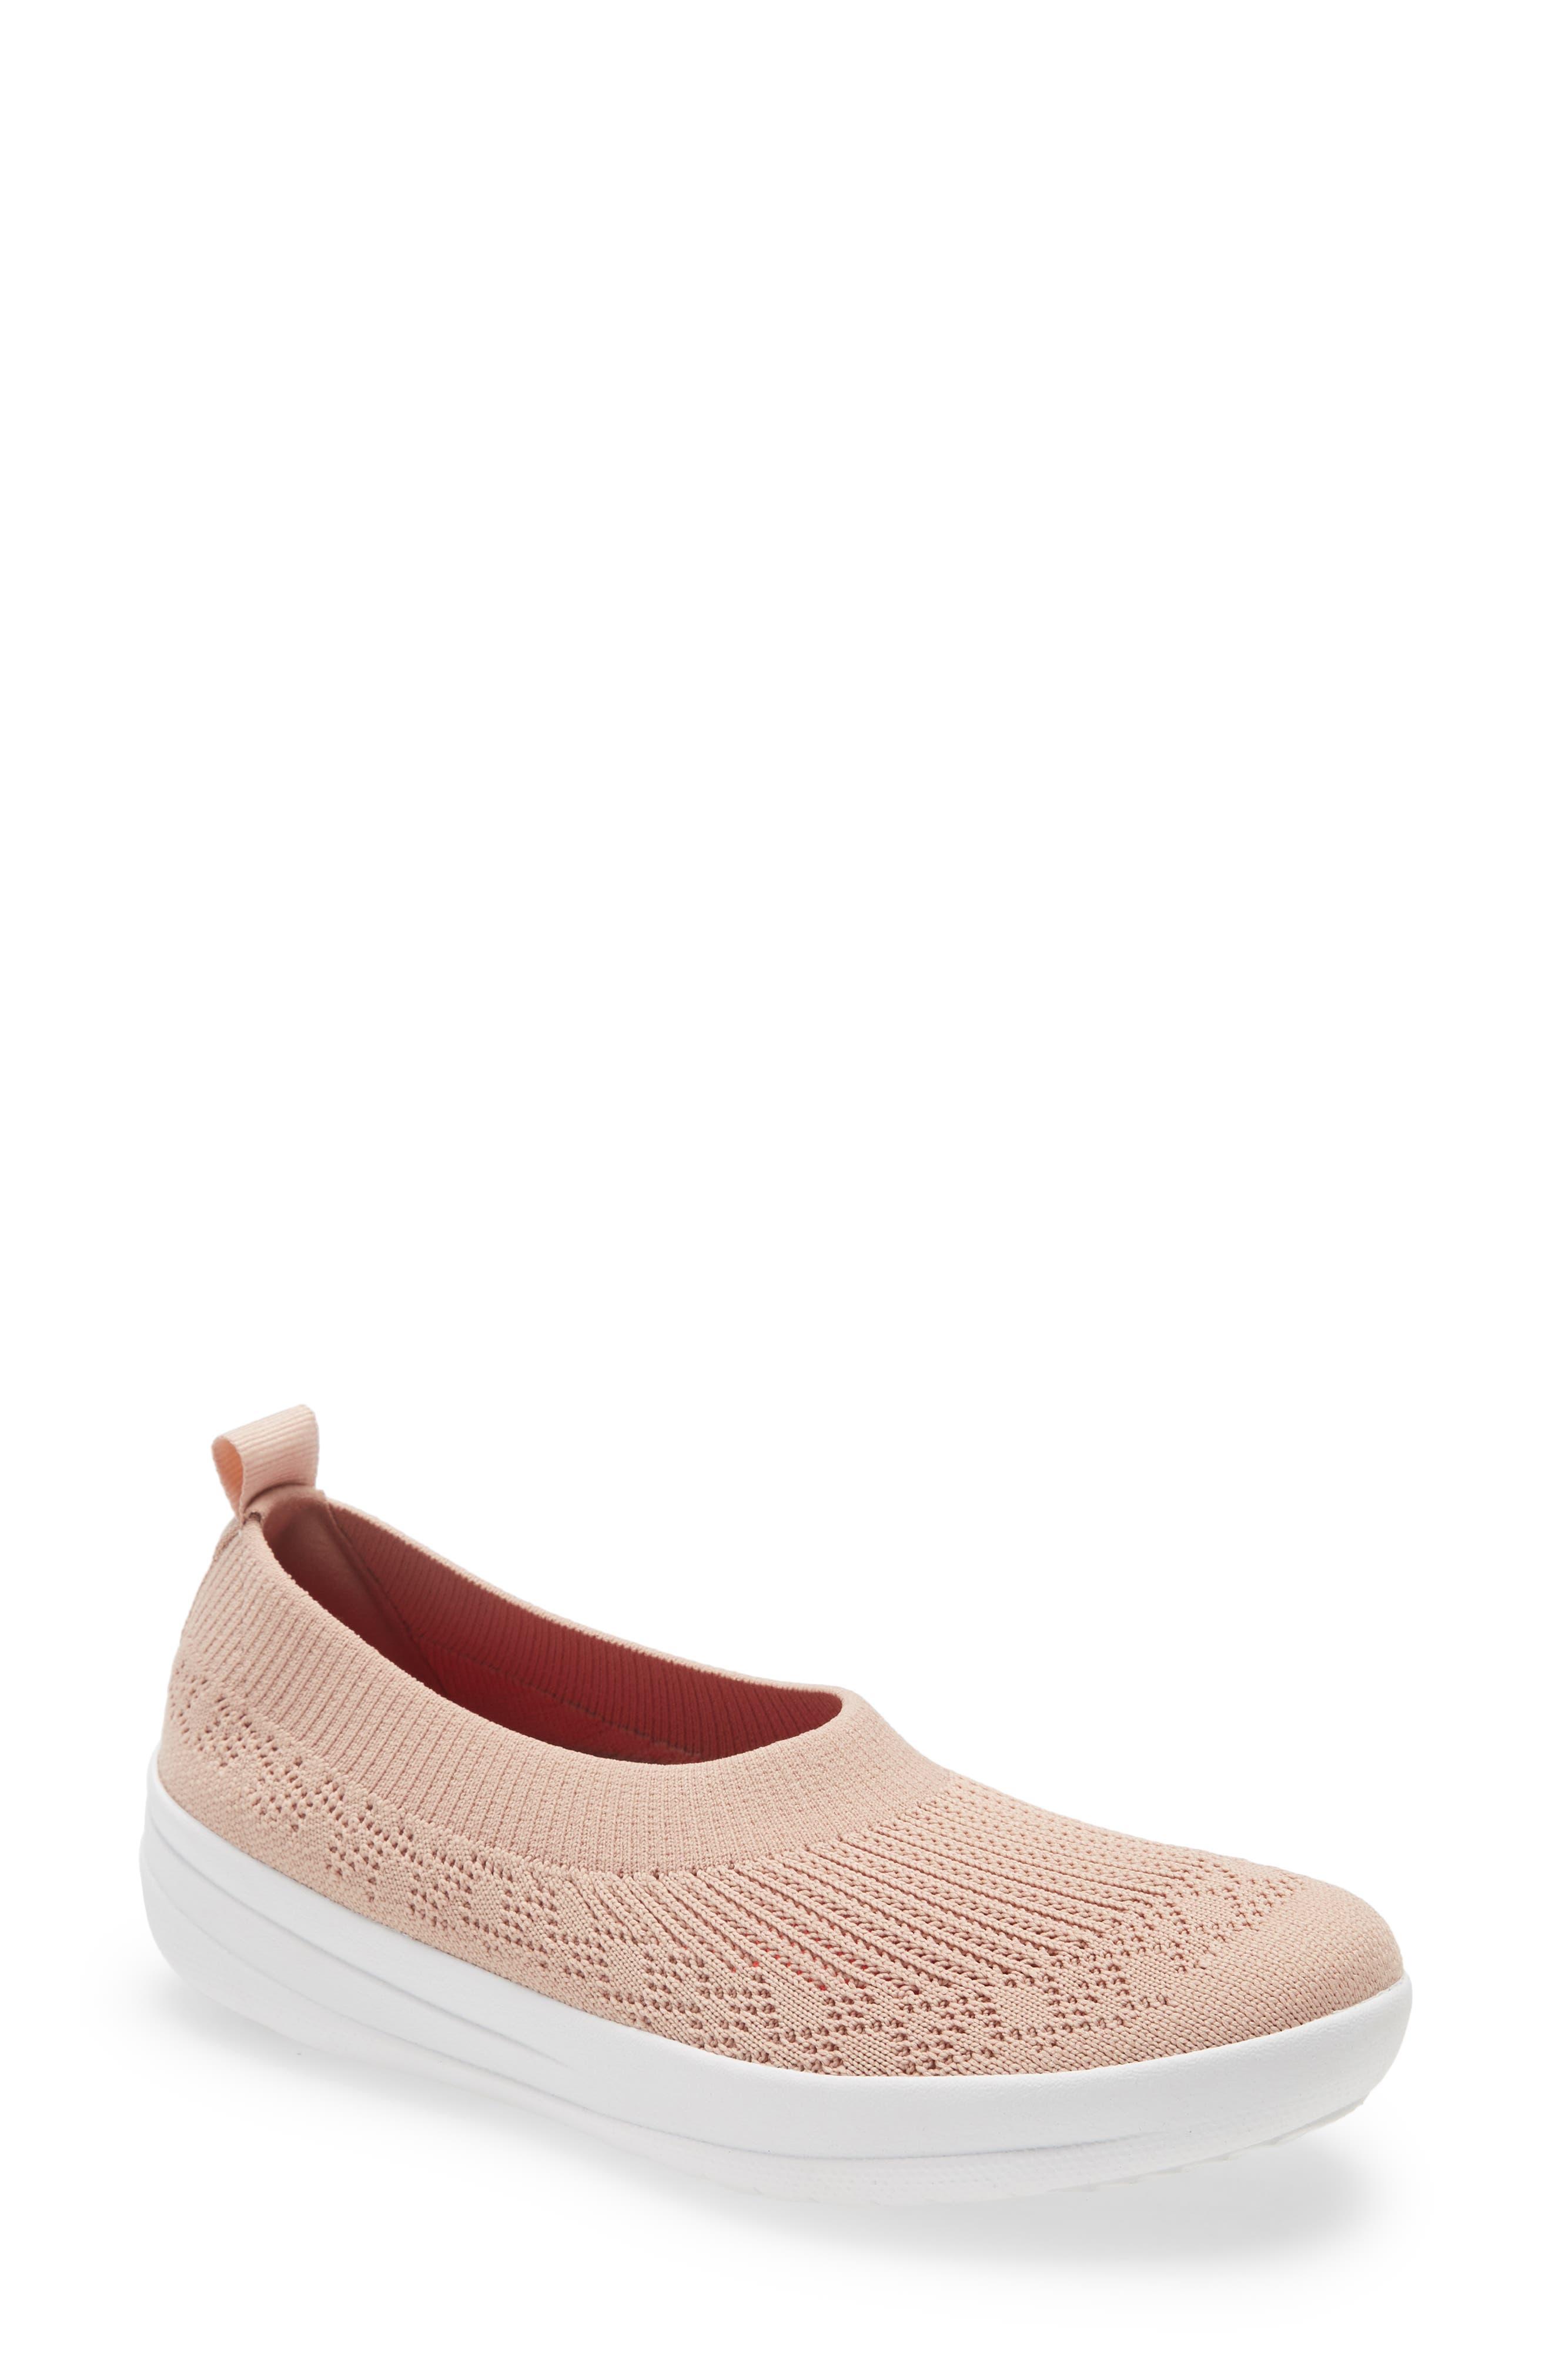 Uberknit Ballerina Flat